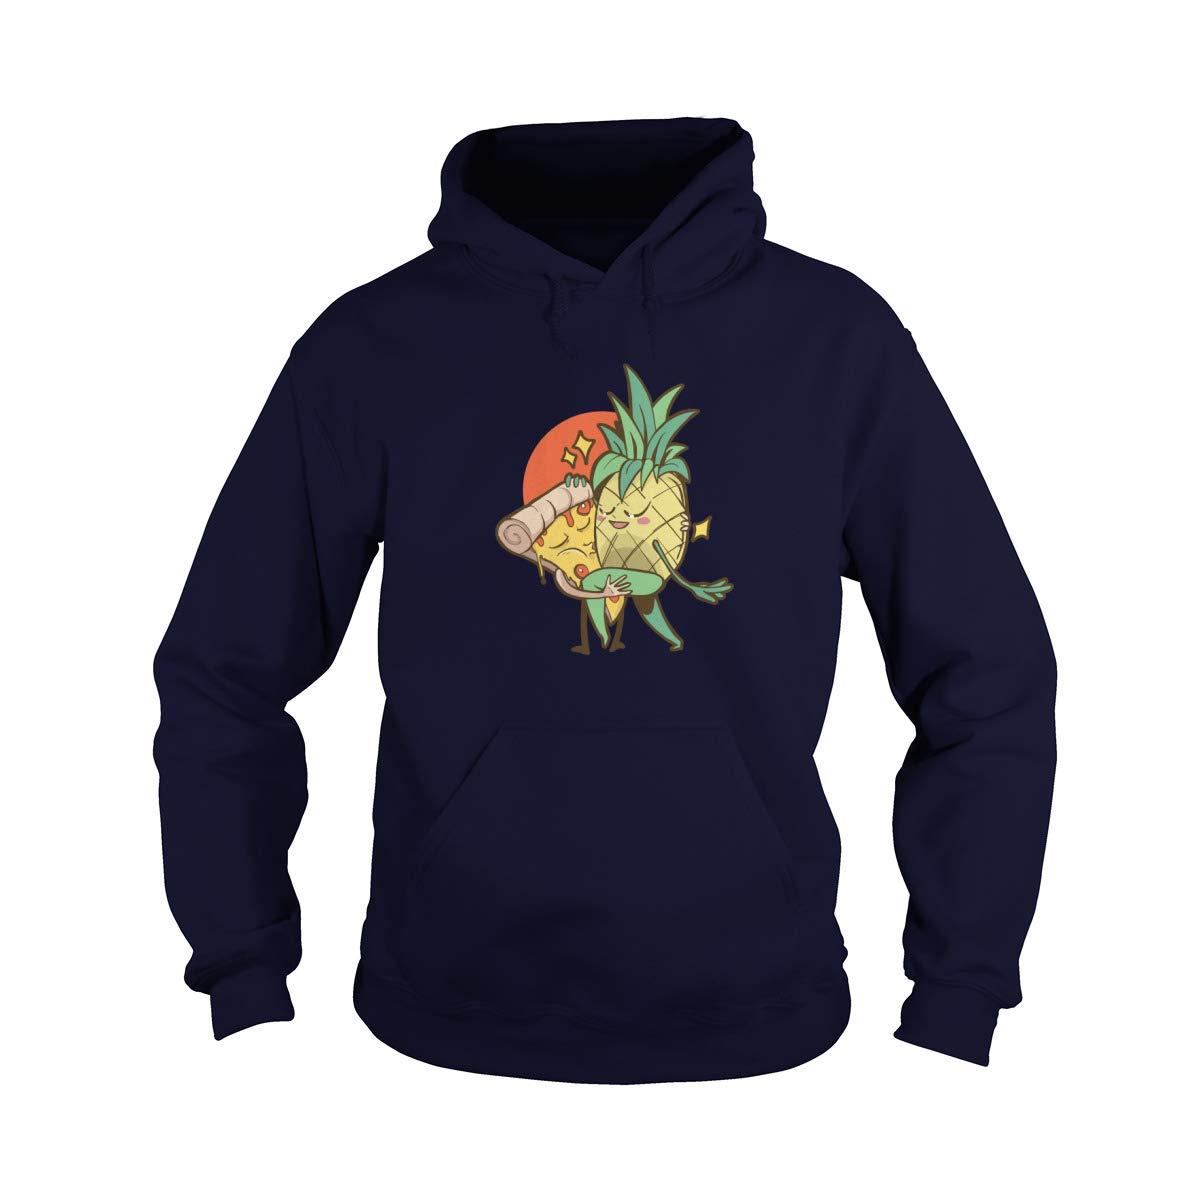 Pizza Pineapple Forbidden Love Adult Hooded Sweatshirt